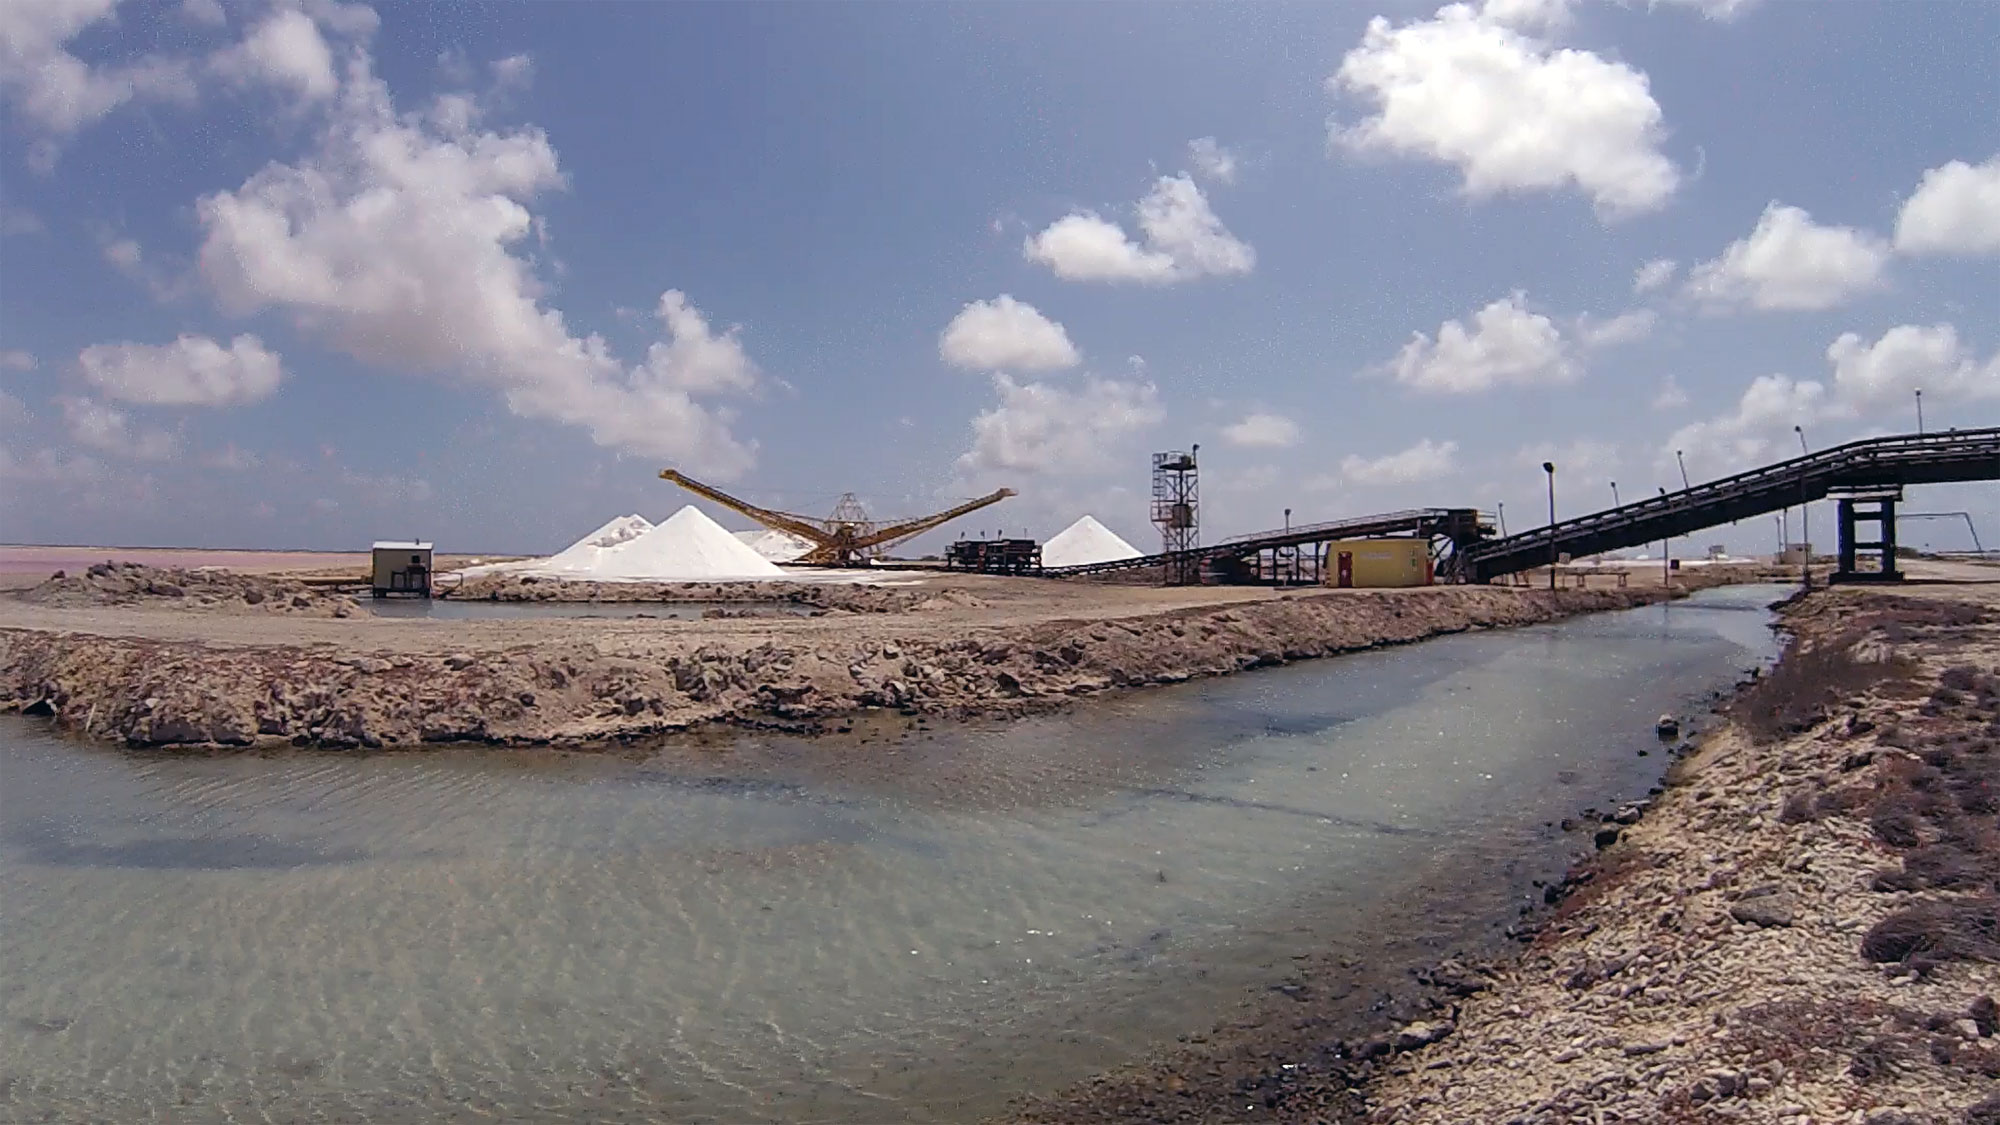 The salt pier